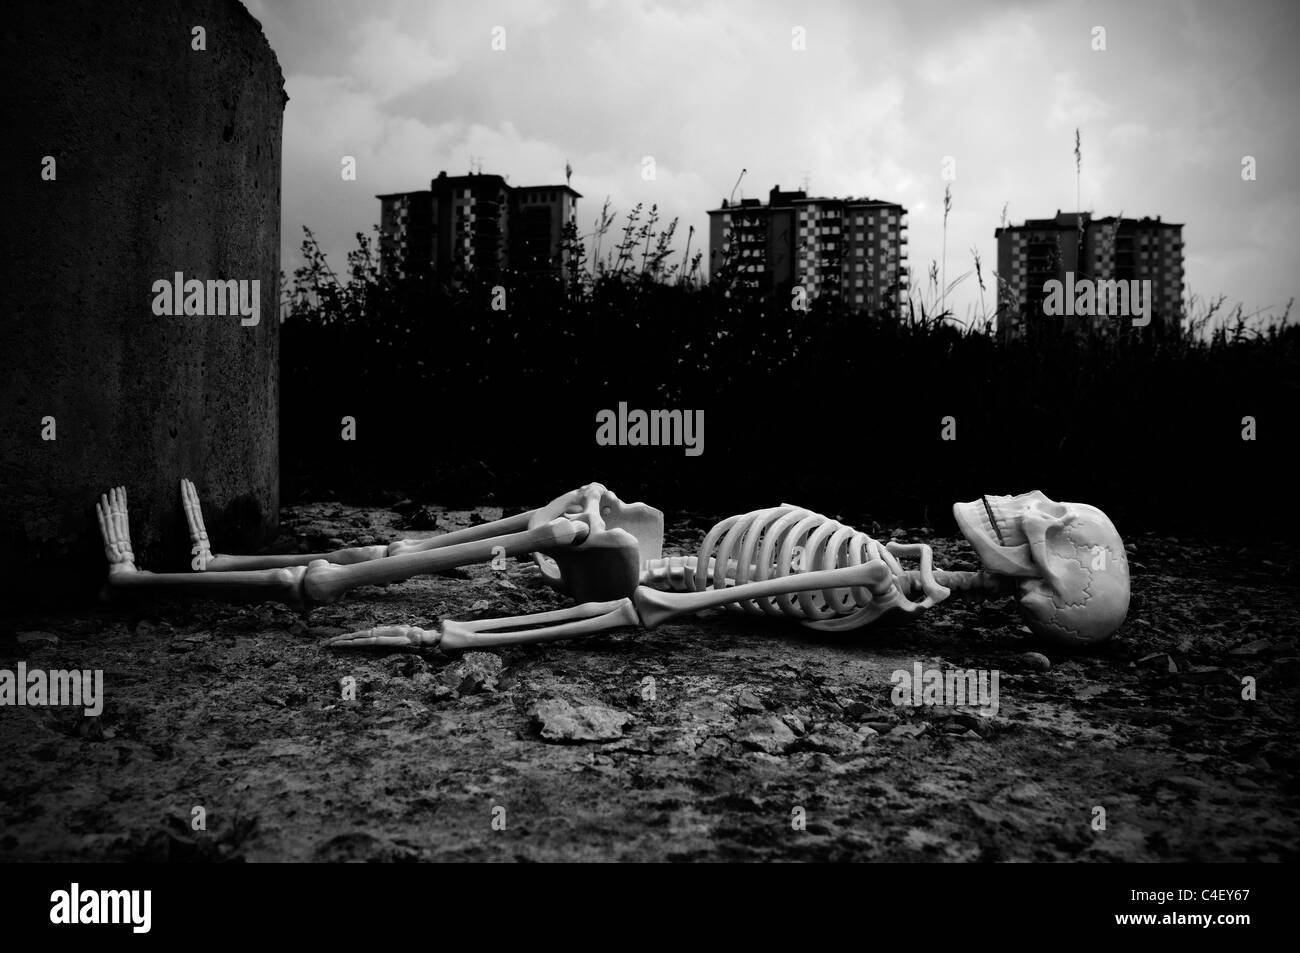 Skeleton lying on the ground - Stock Image